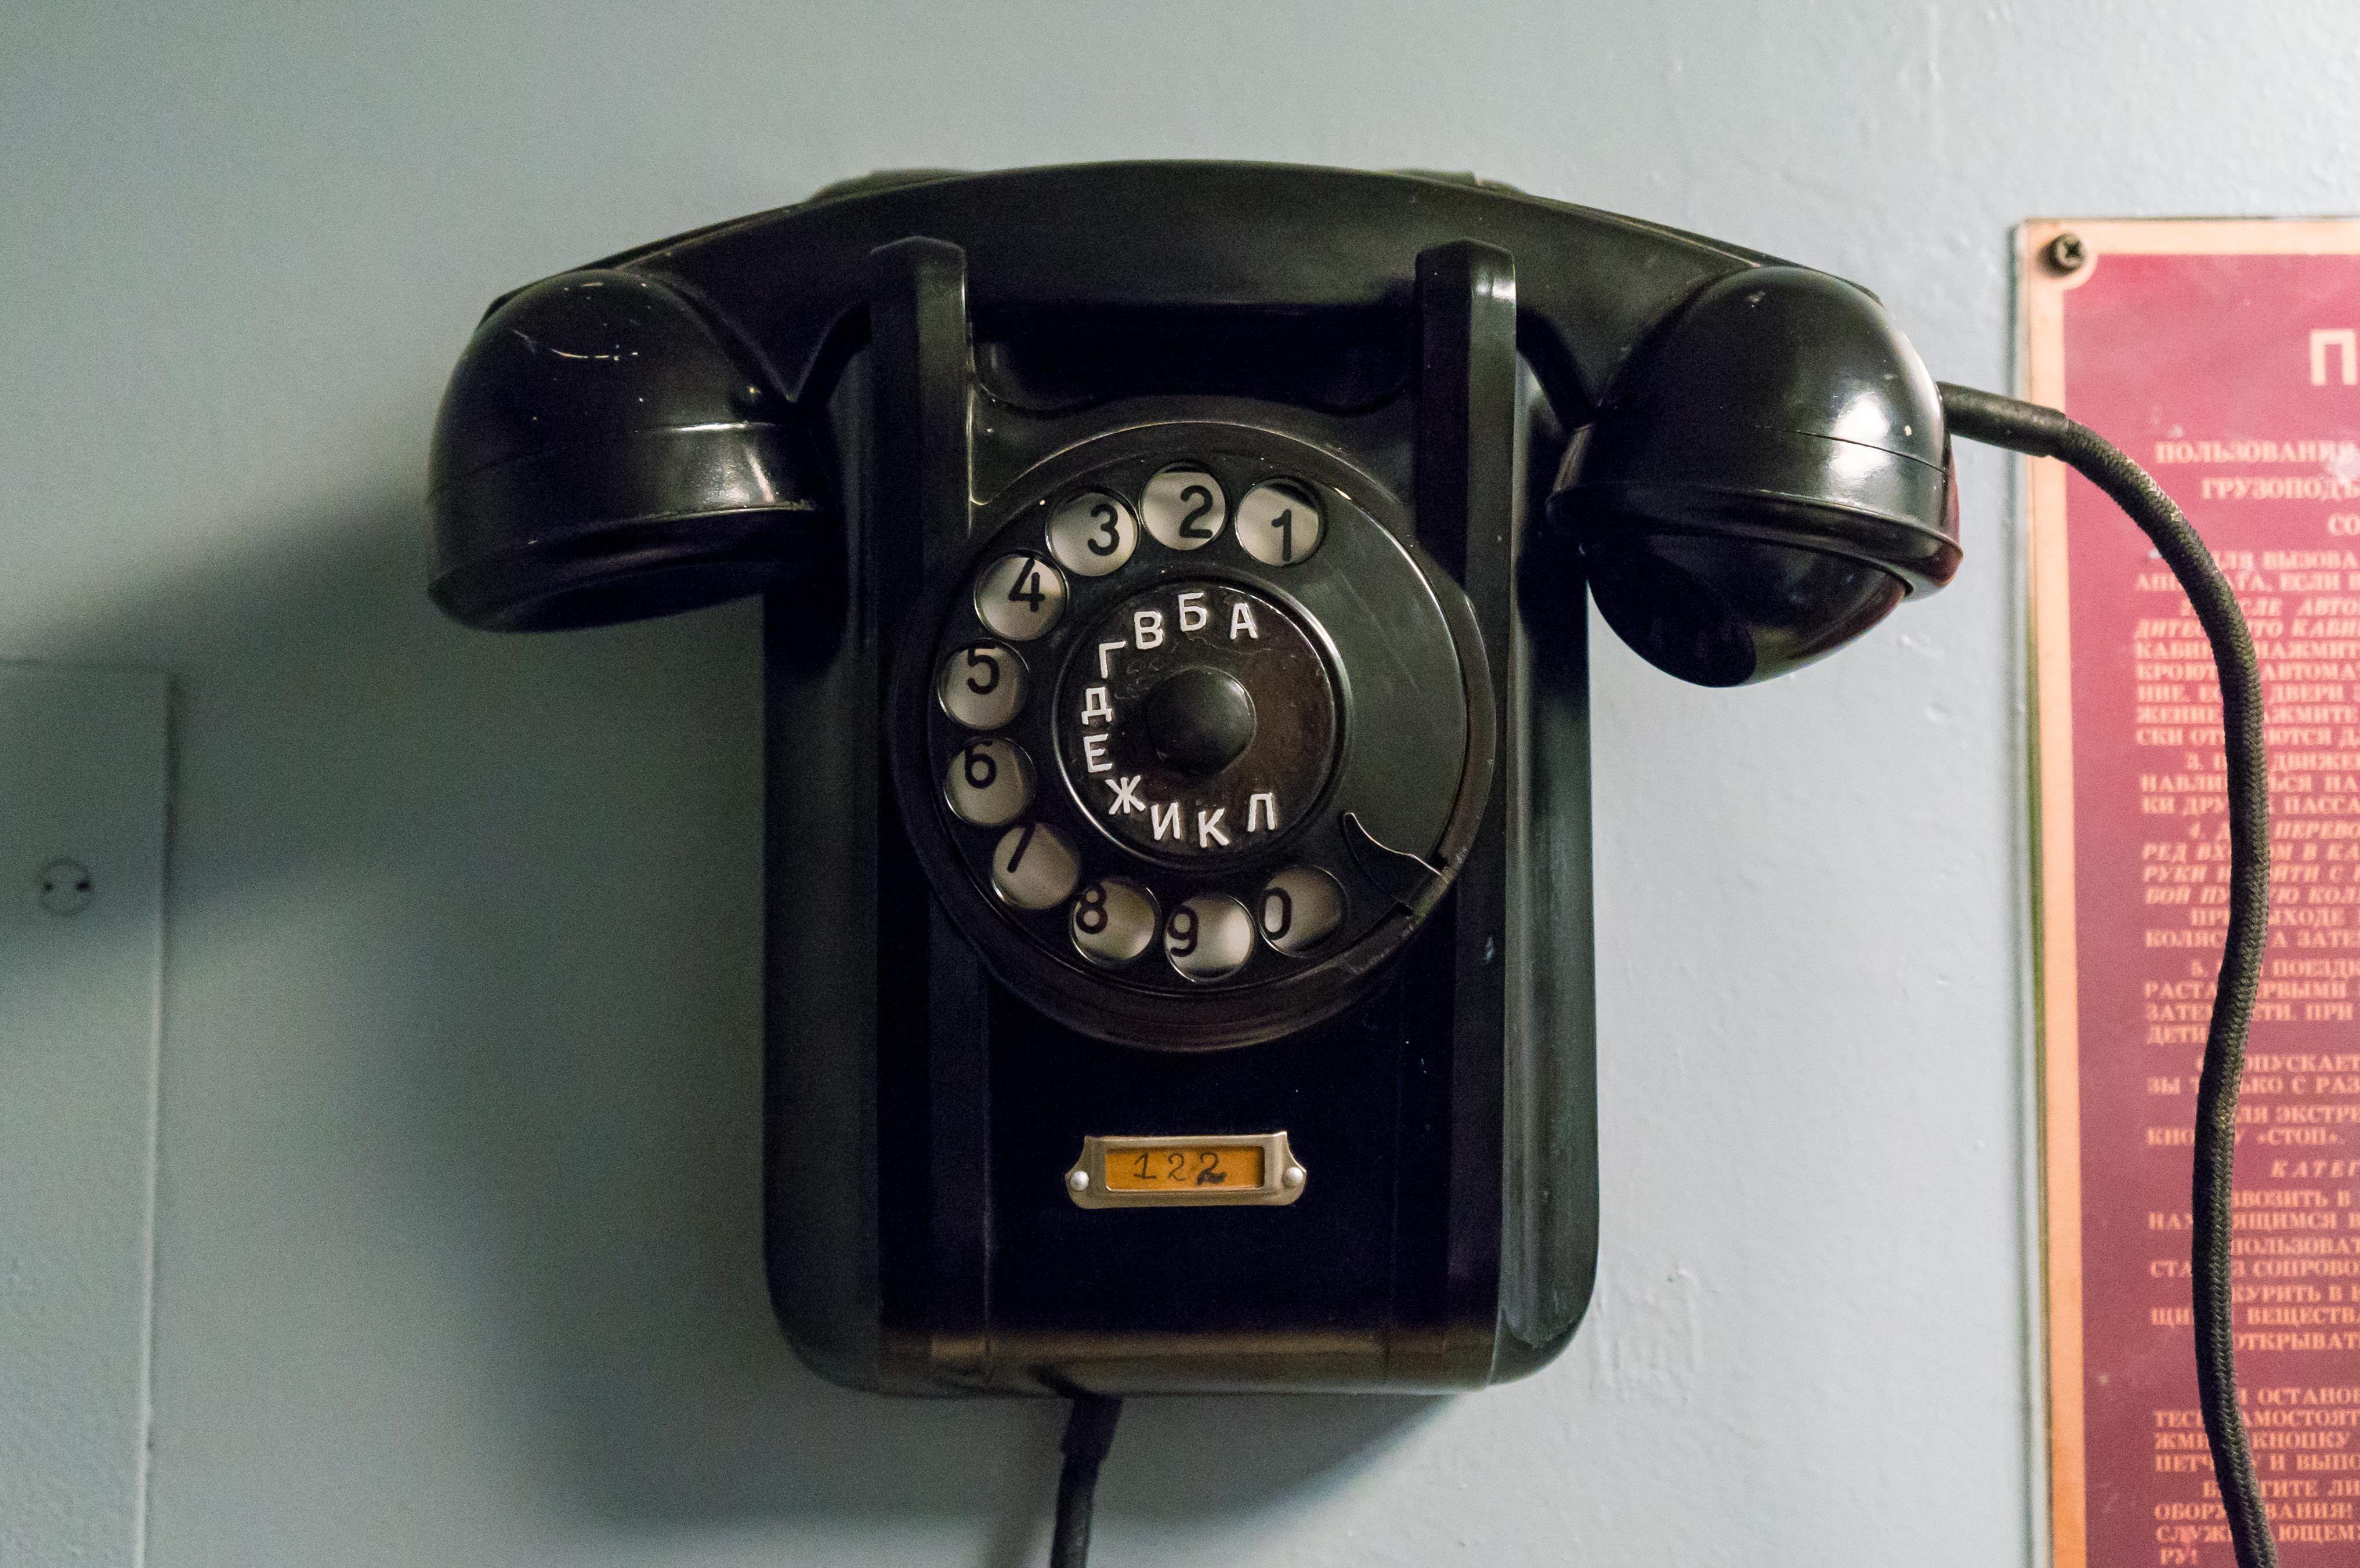 Vintage Retro Landline Phone closeup